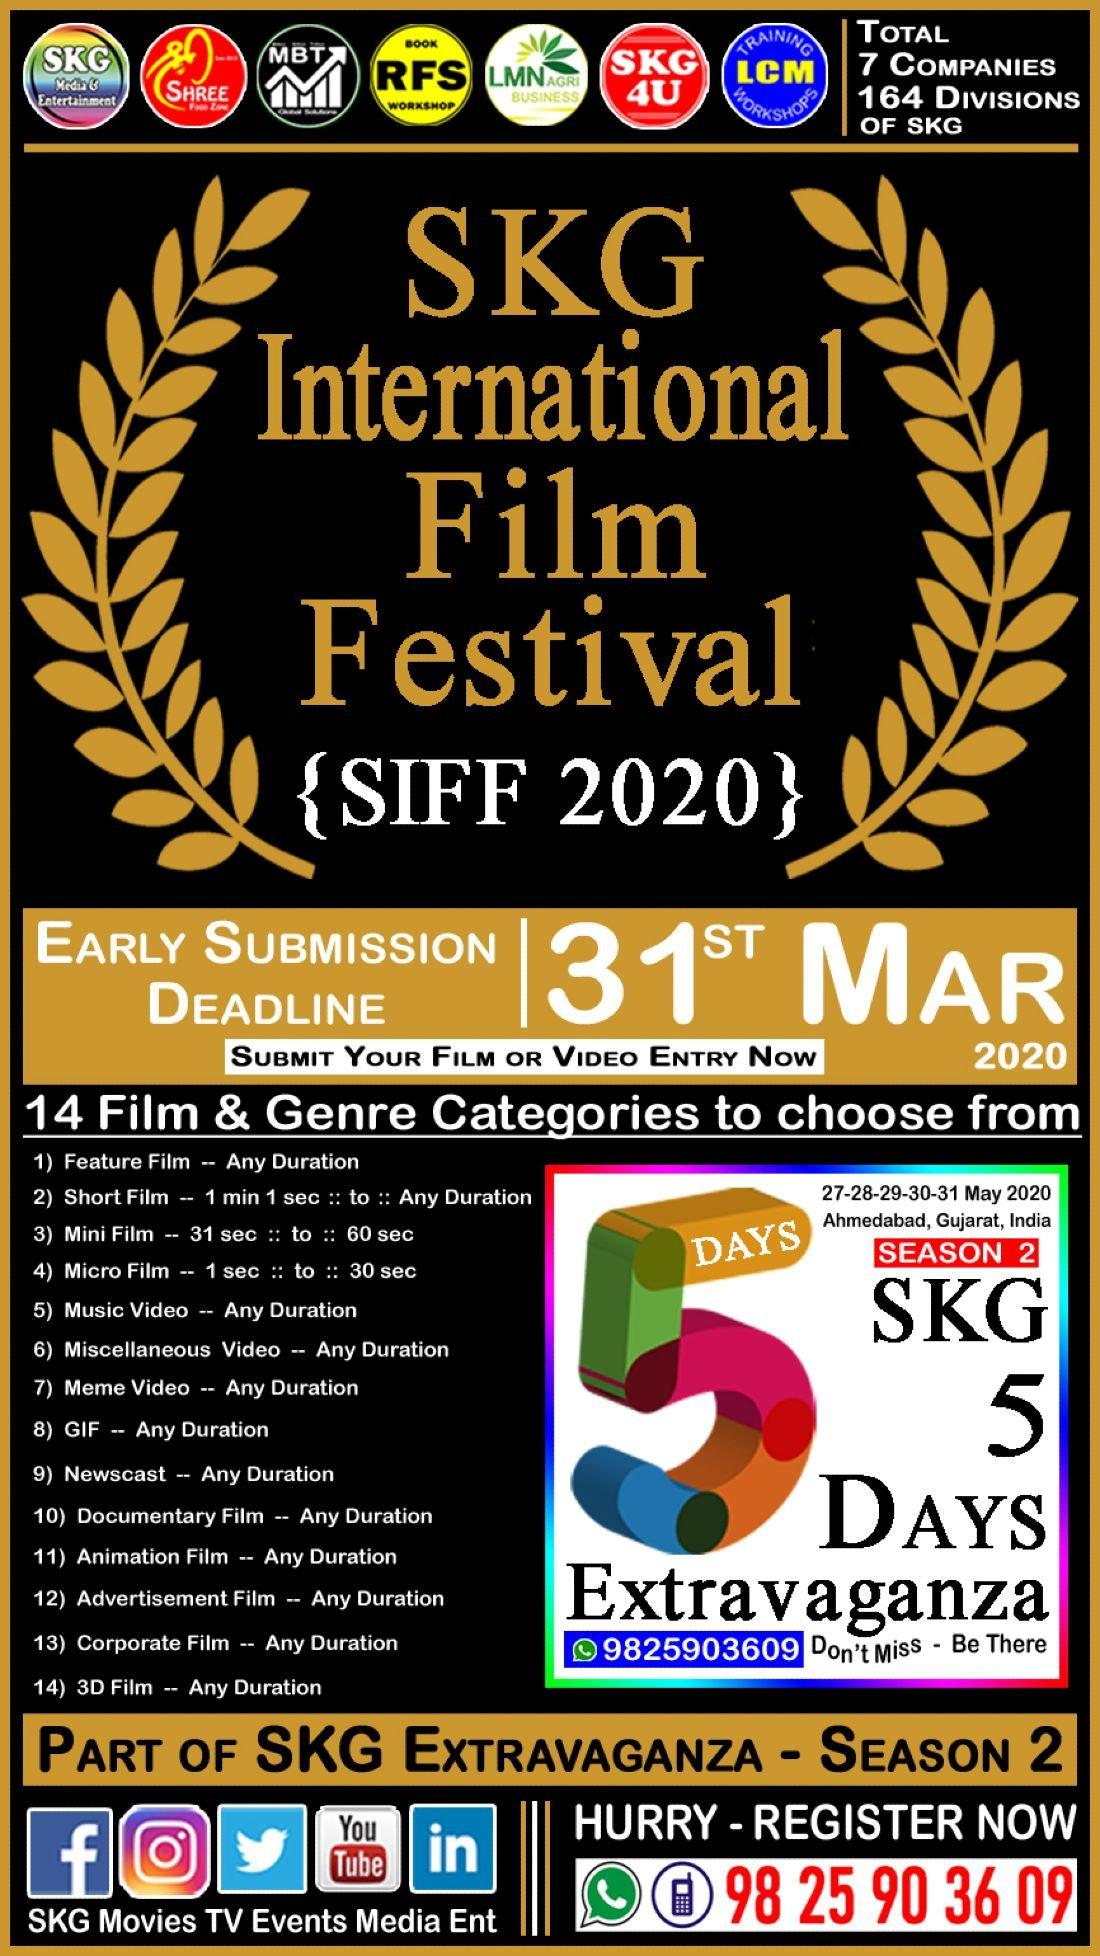 SIFF 2020 - SKG International Film Festival